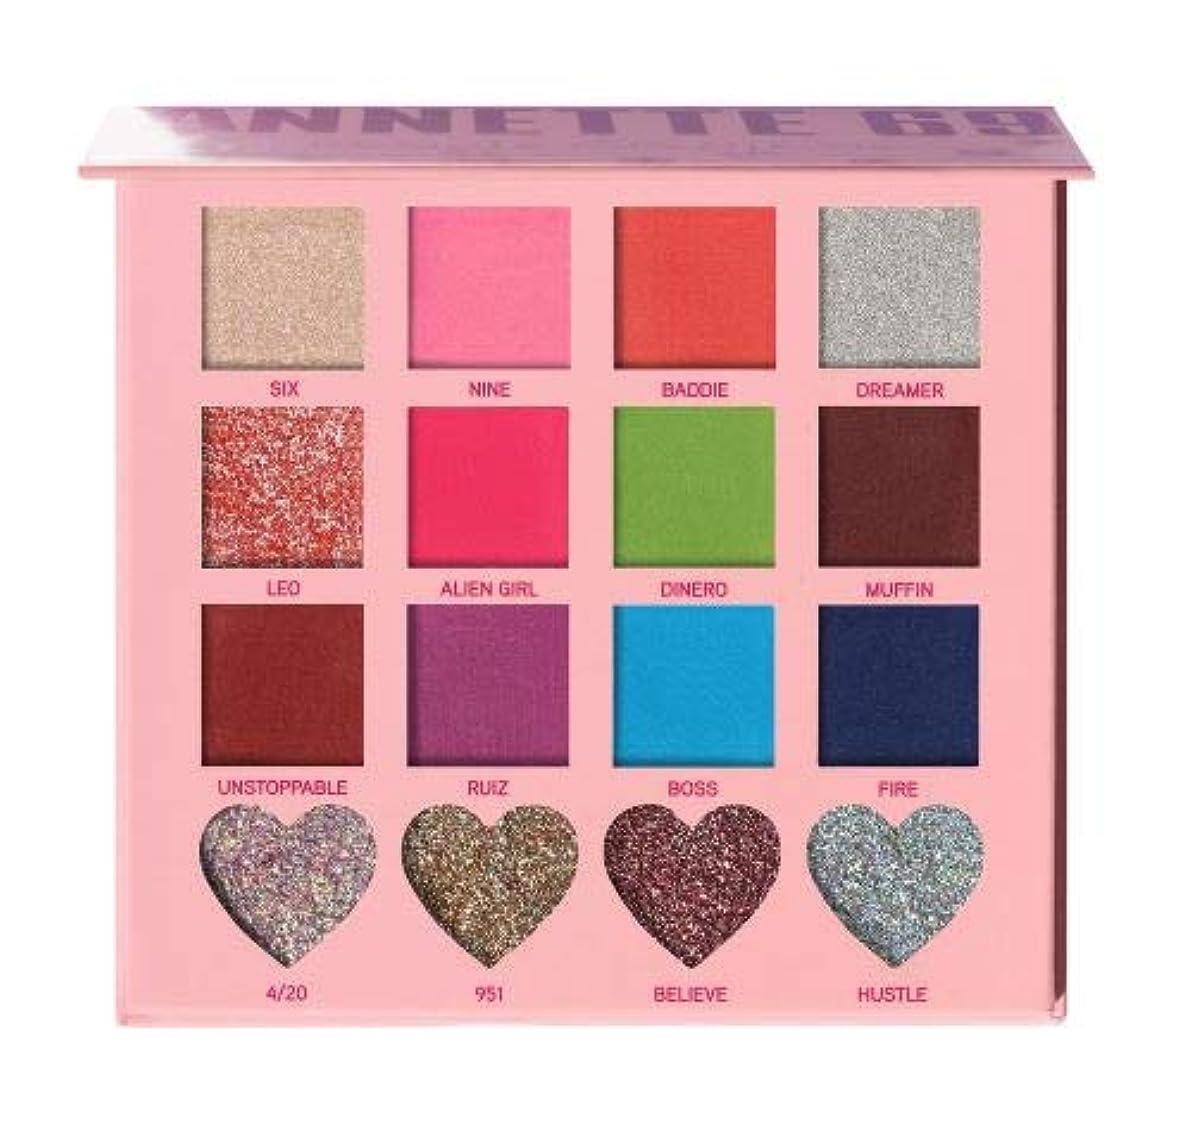 援助十分顔料(3 Pack) BEAUTY CREATIONS x Annette 69 Eyeshadow Palette (並行輸入品)